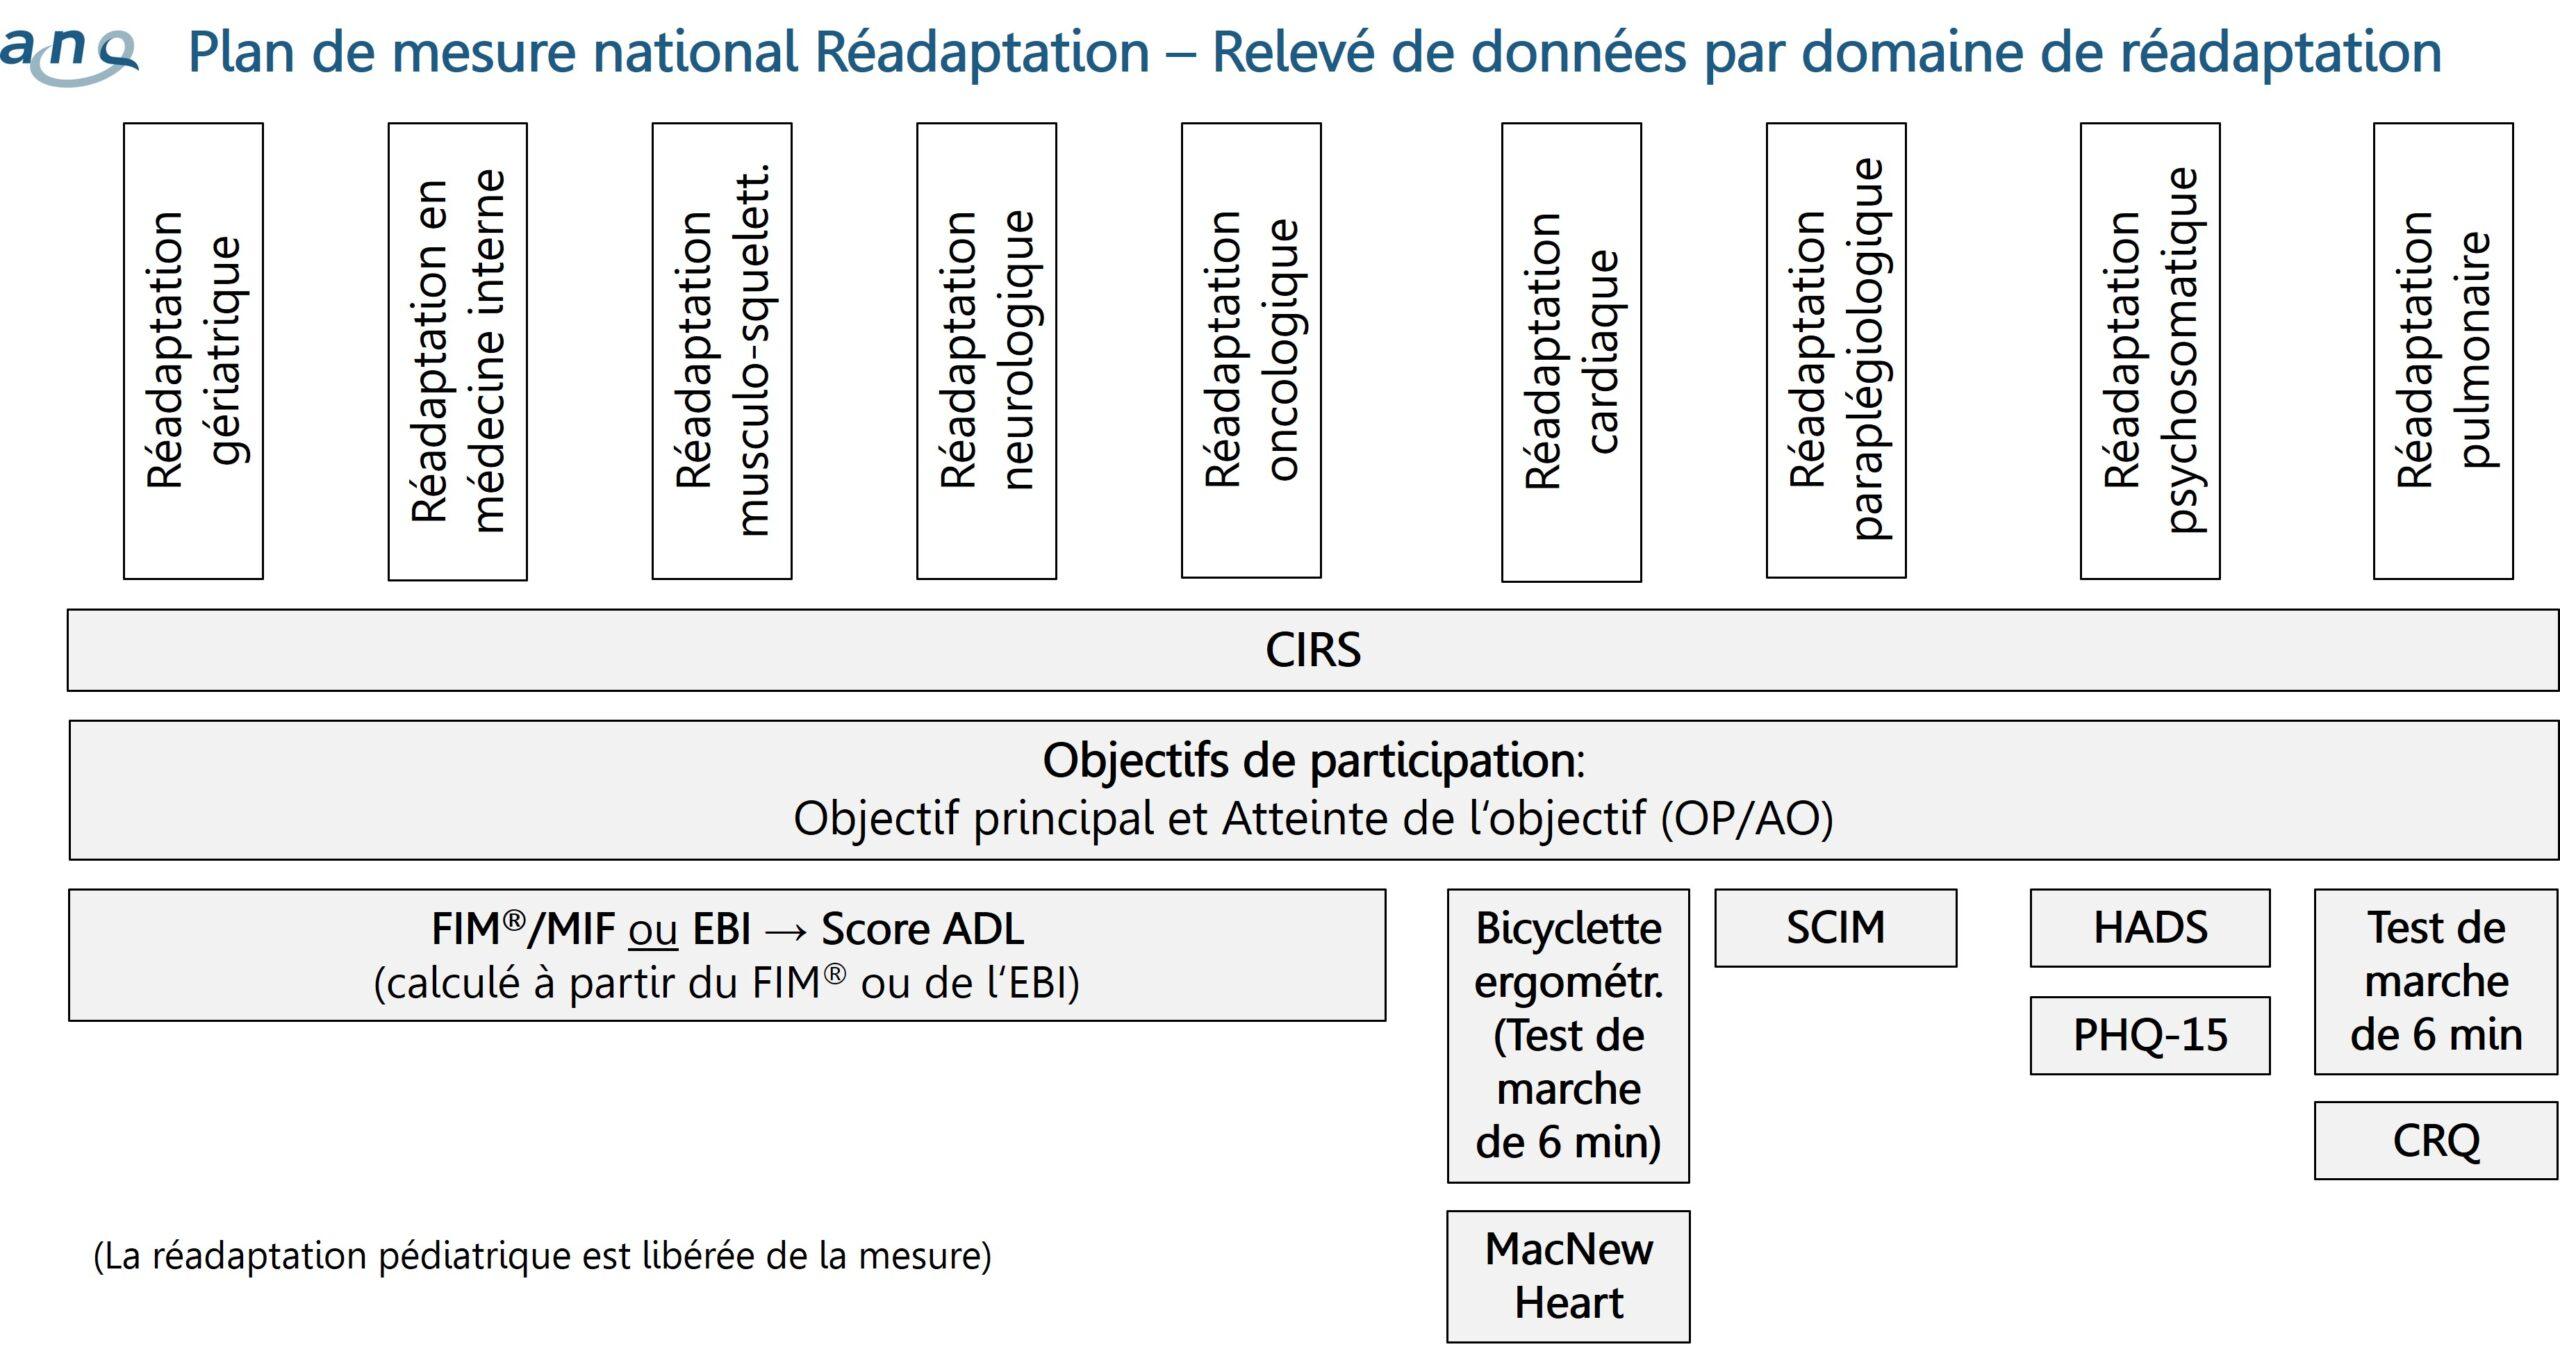 Plan-de-mesure-readaptation_a-partir_juillet_2021